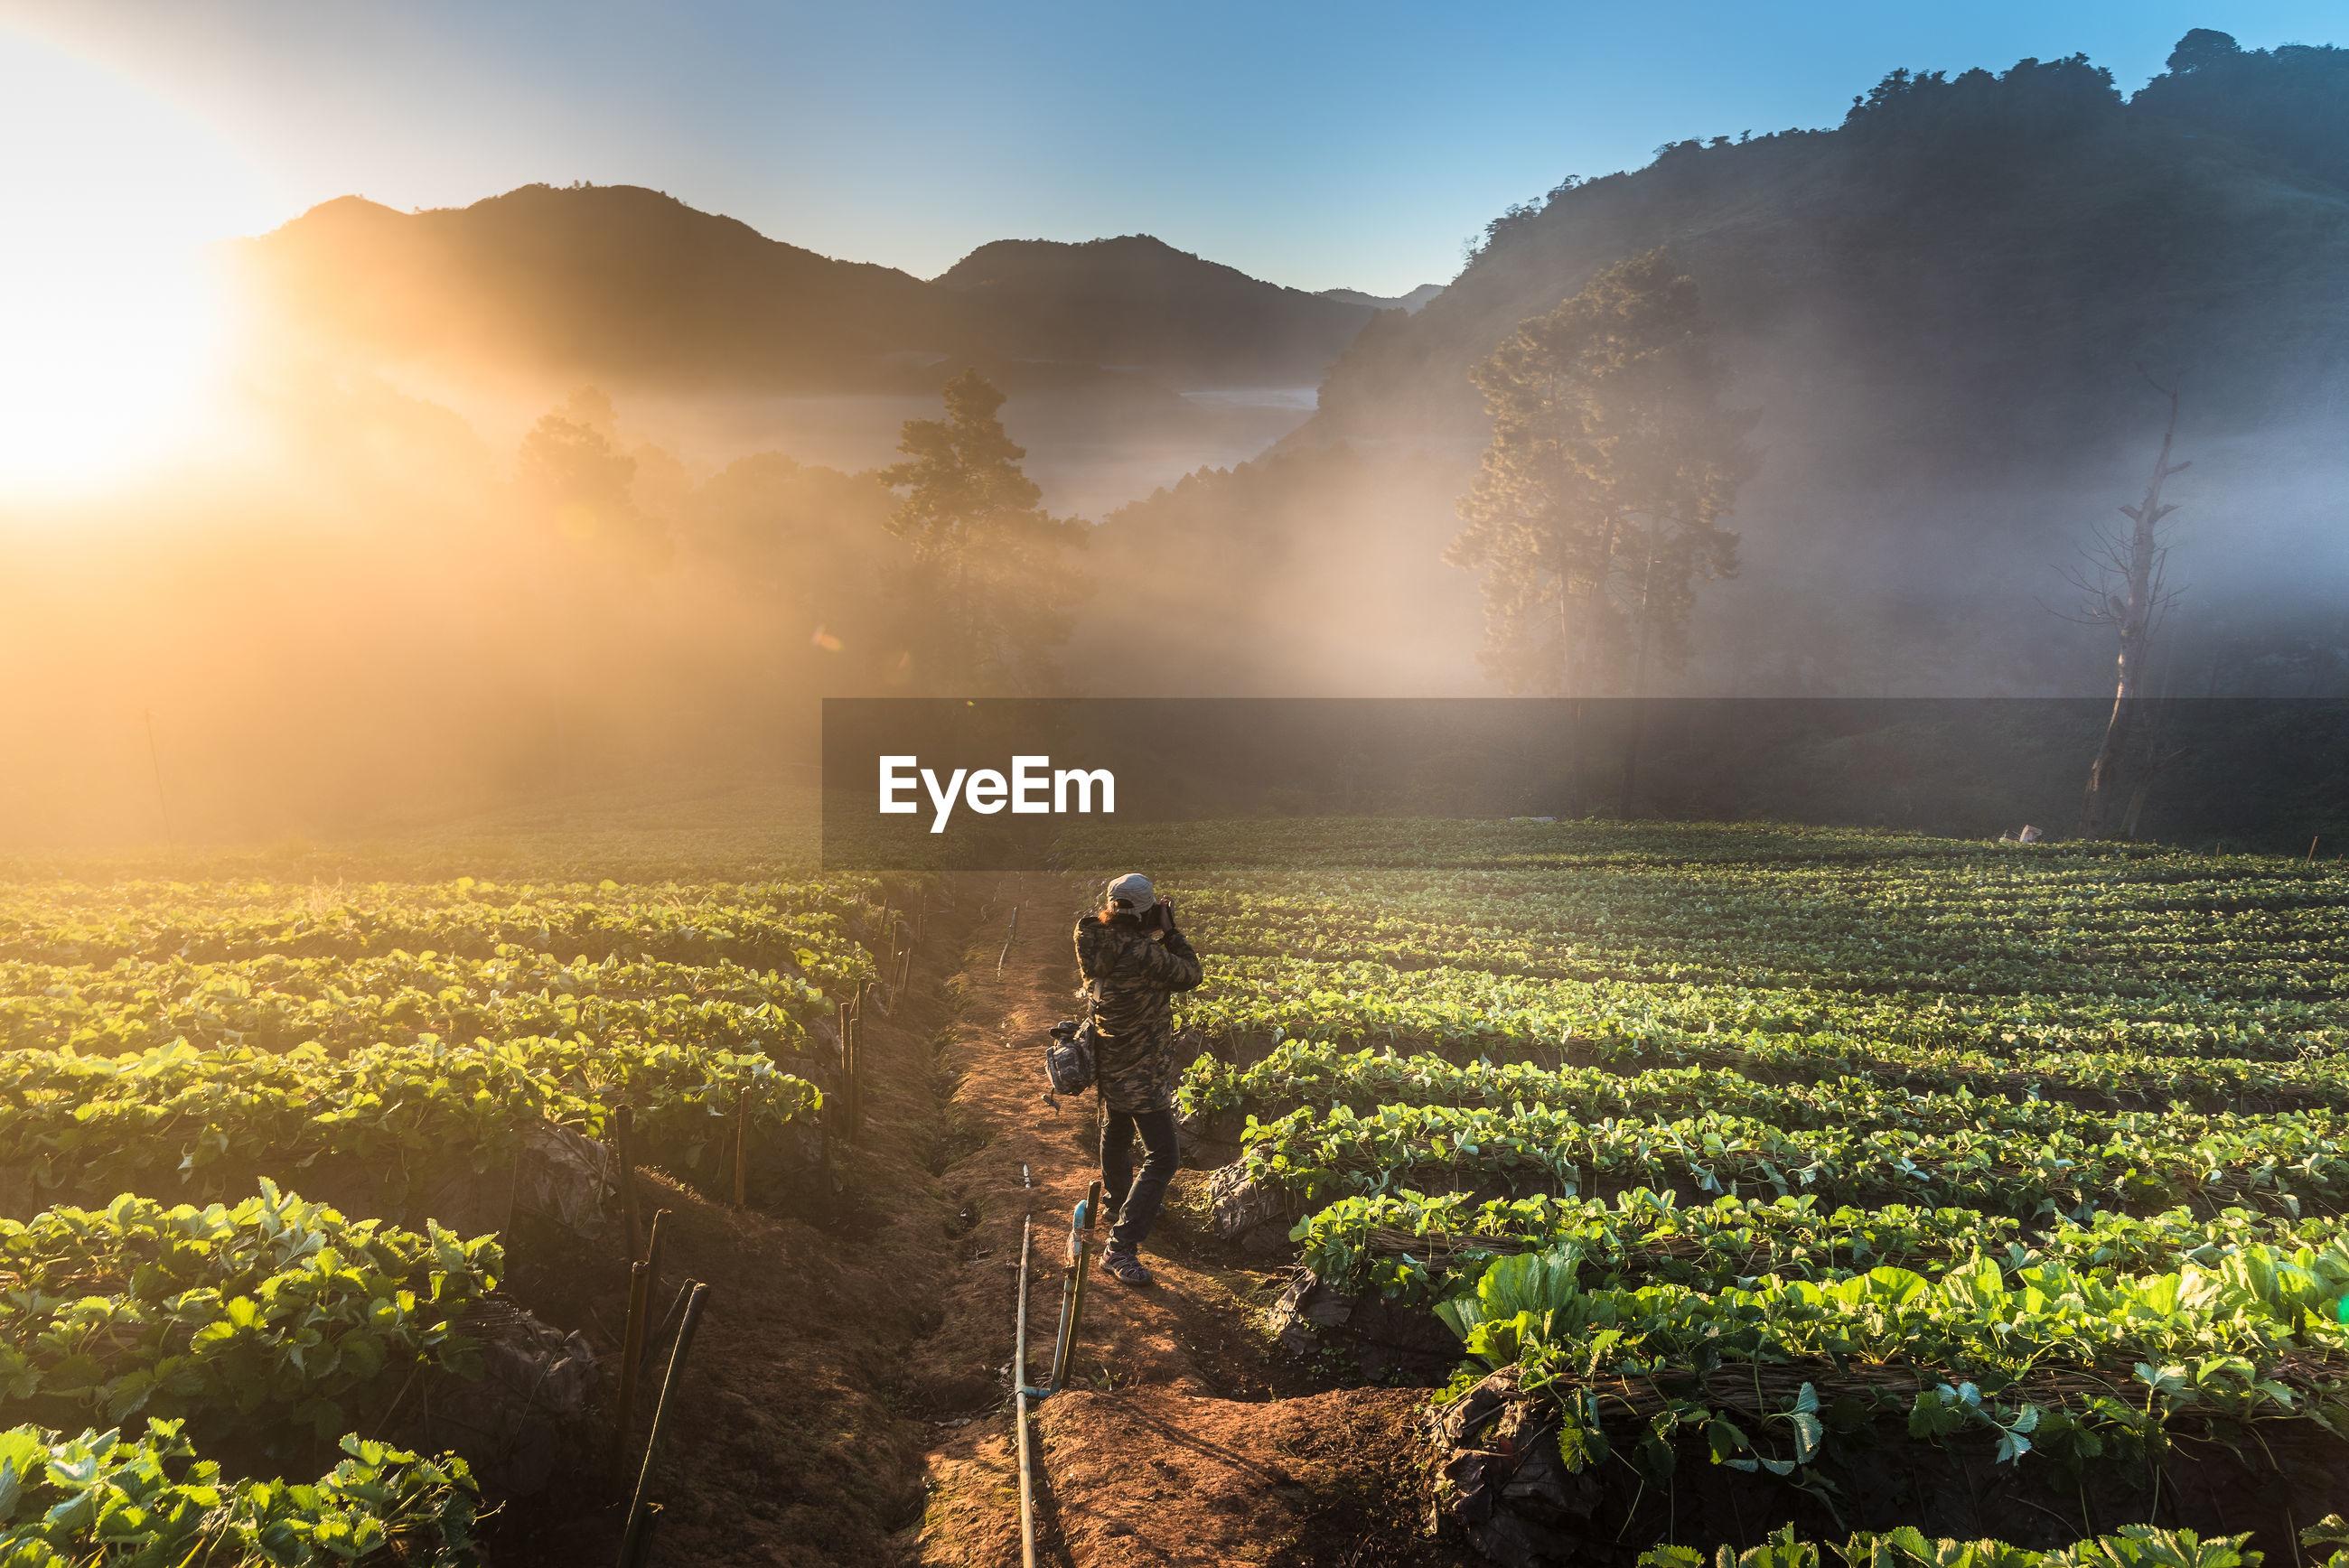 Tea plantation on doi ang khang mountain during foggy weather